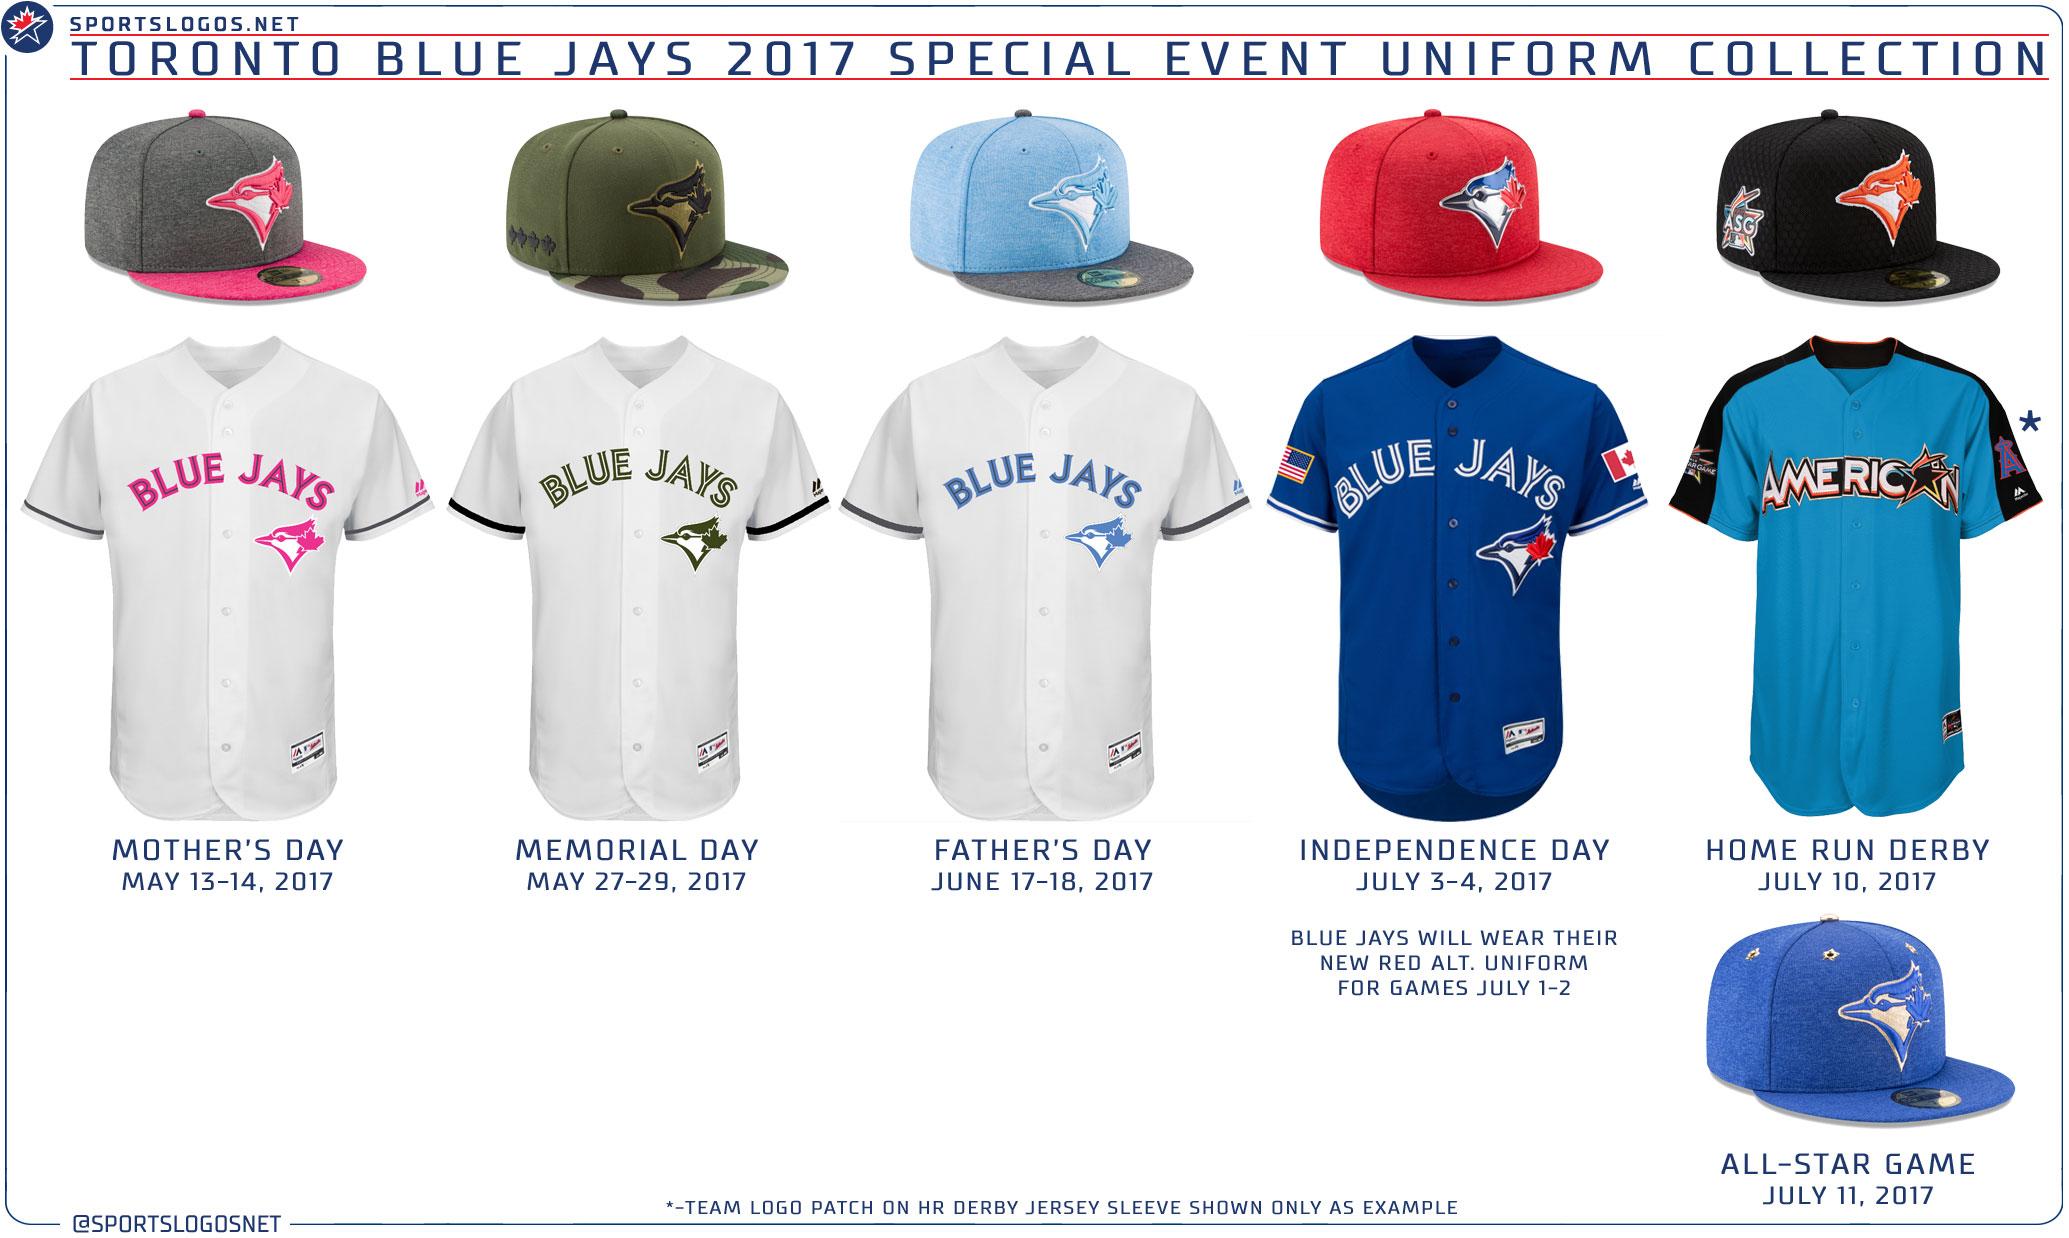 8f971caa668 Blue Jays 2017 Special Event uniforms.   Torontobluejays